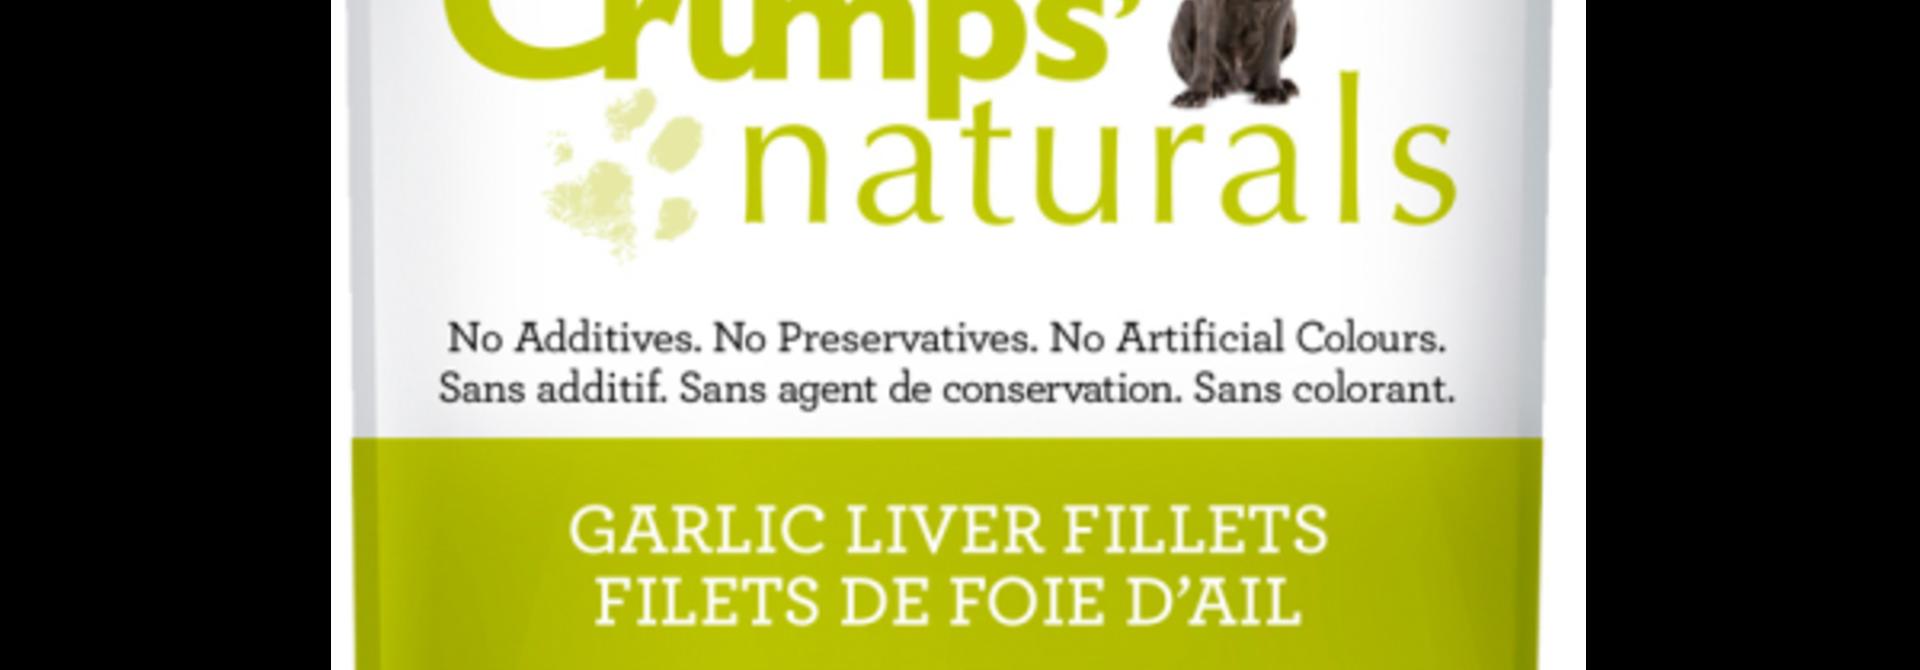 Crumps Garlic Liver Fillets  5.6oz